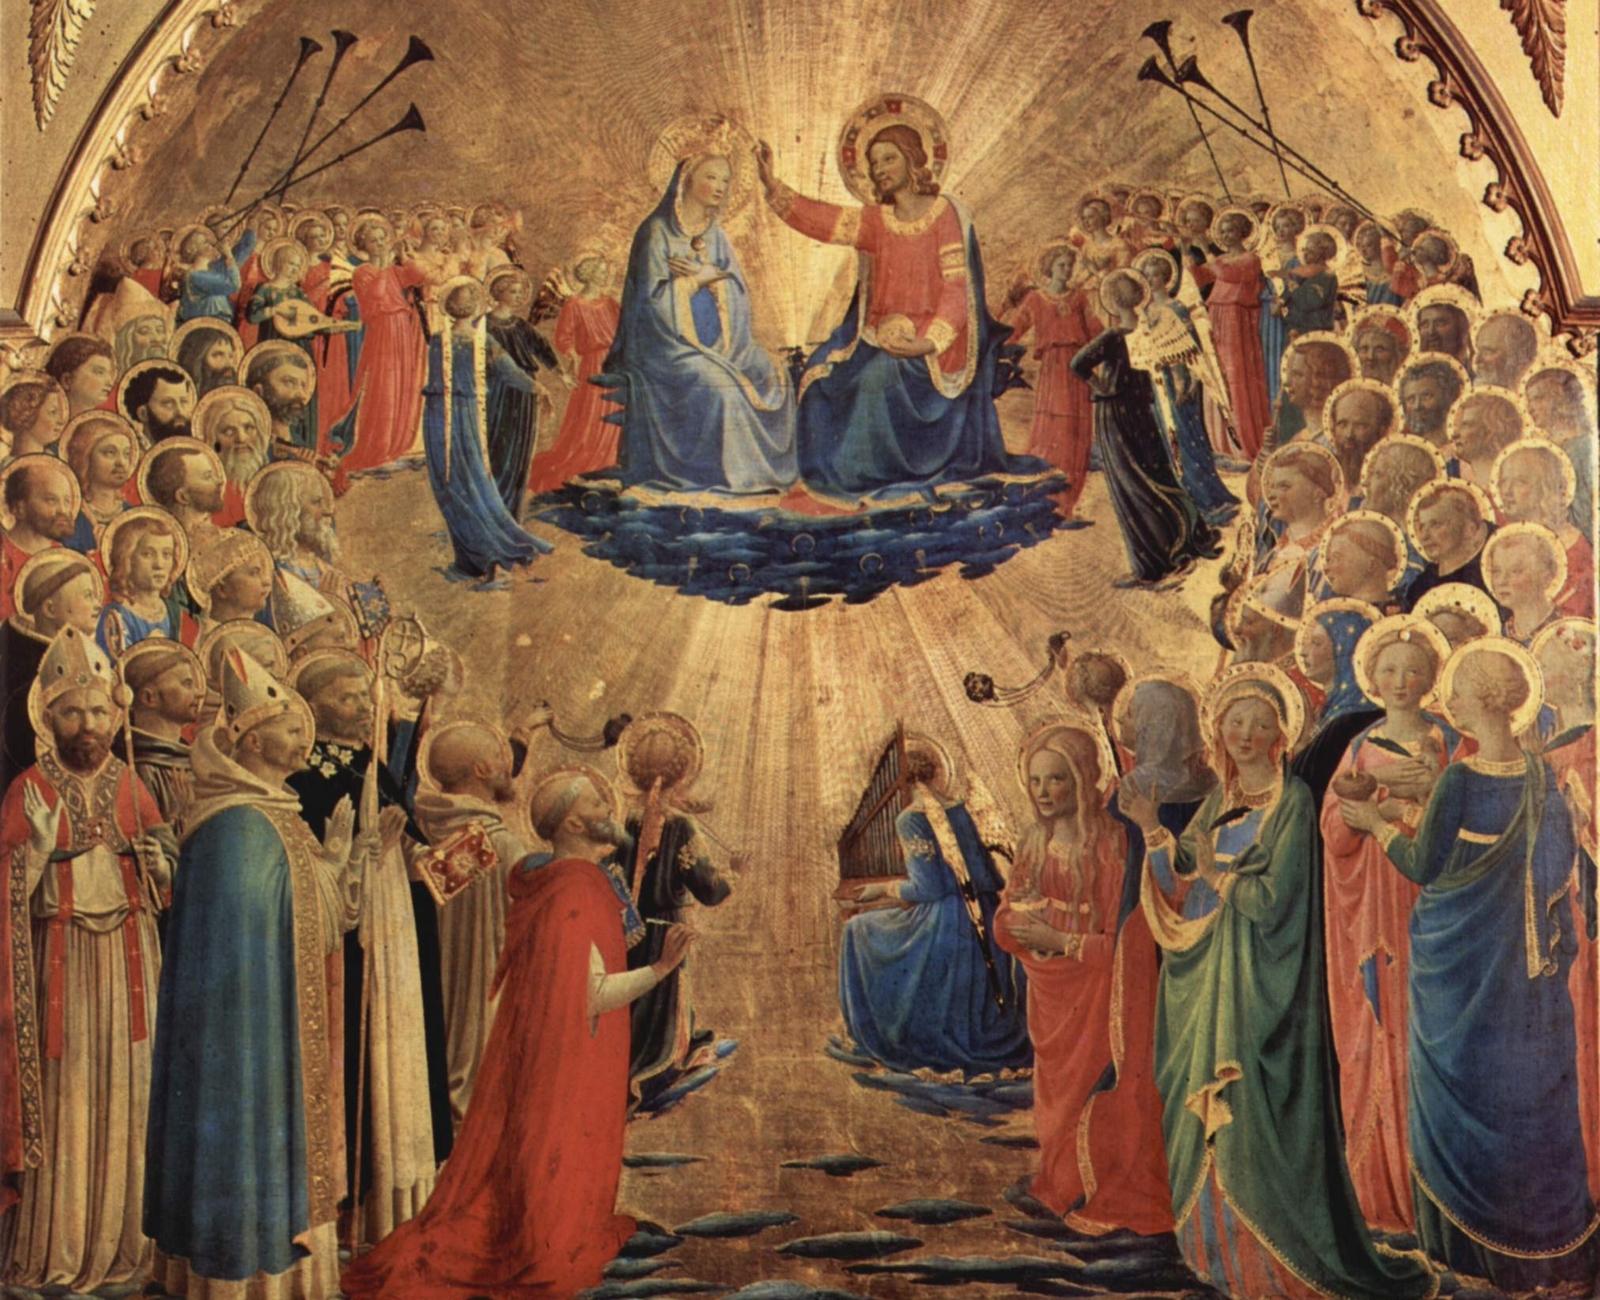 Un Apasionante relato de la Vida de la Santísima Virgen